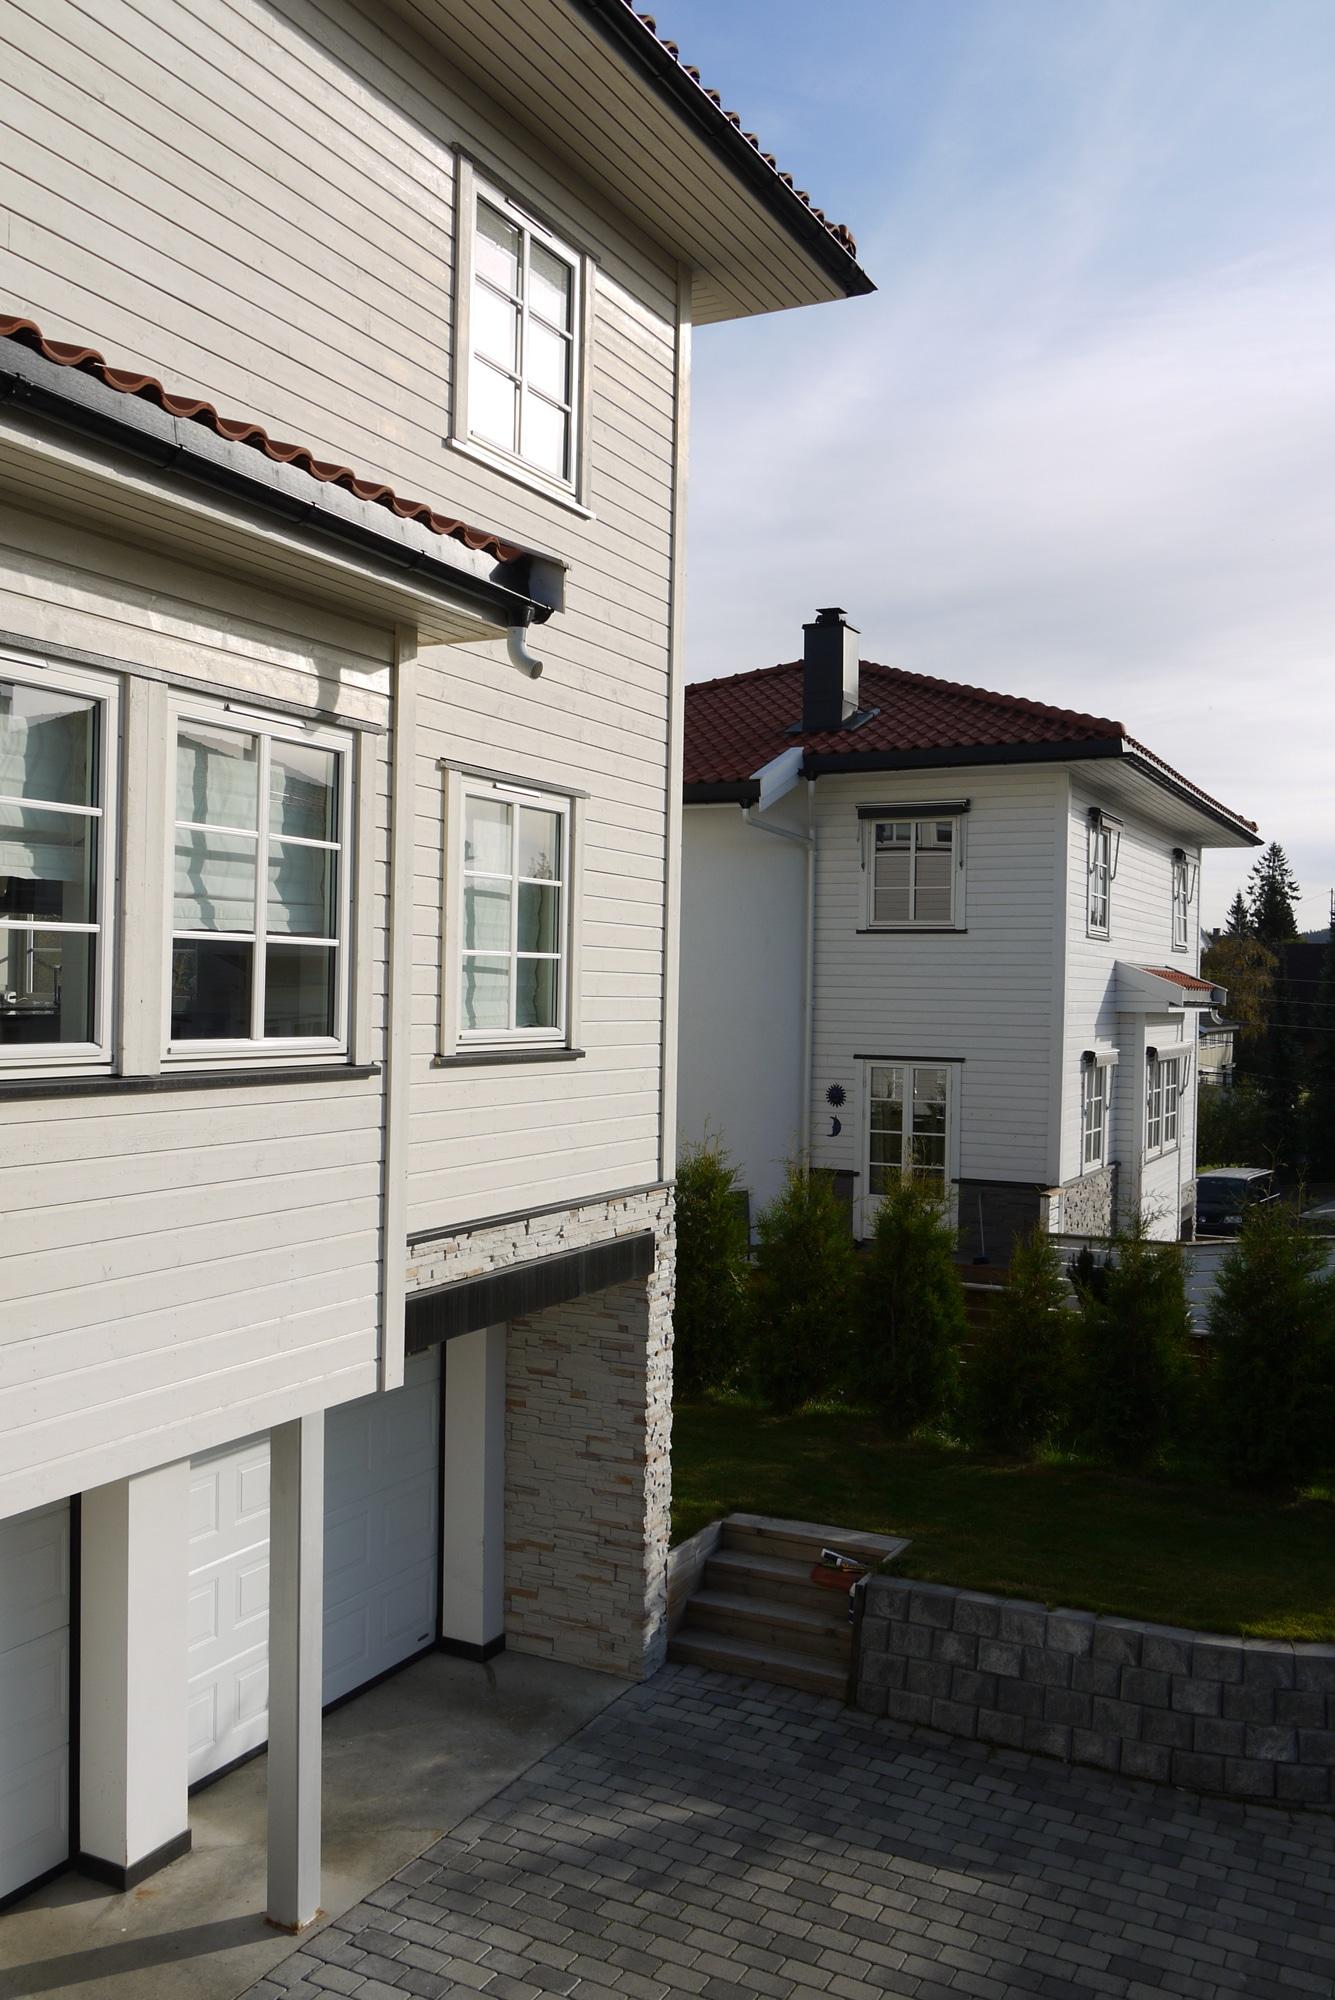 28 Fire nye boliger i tun 02